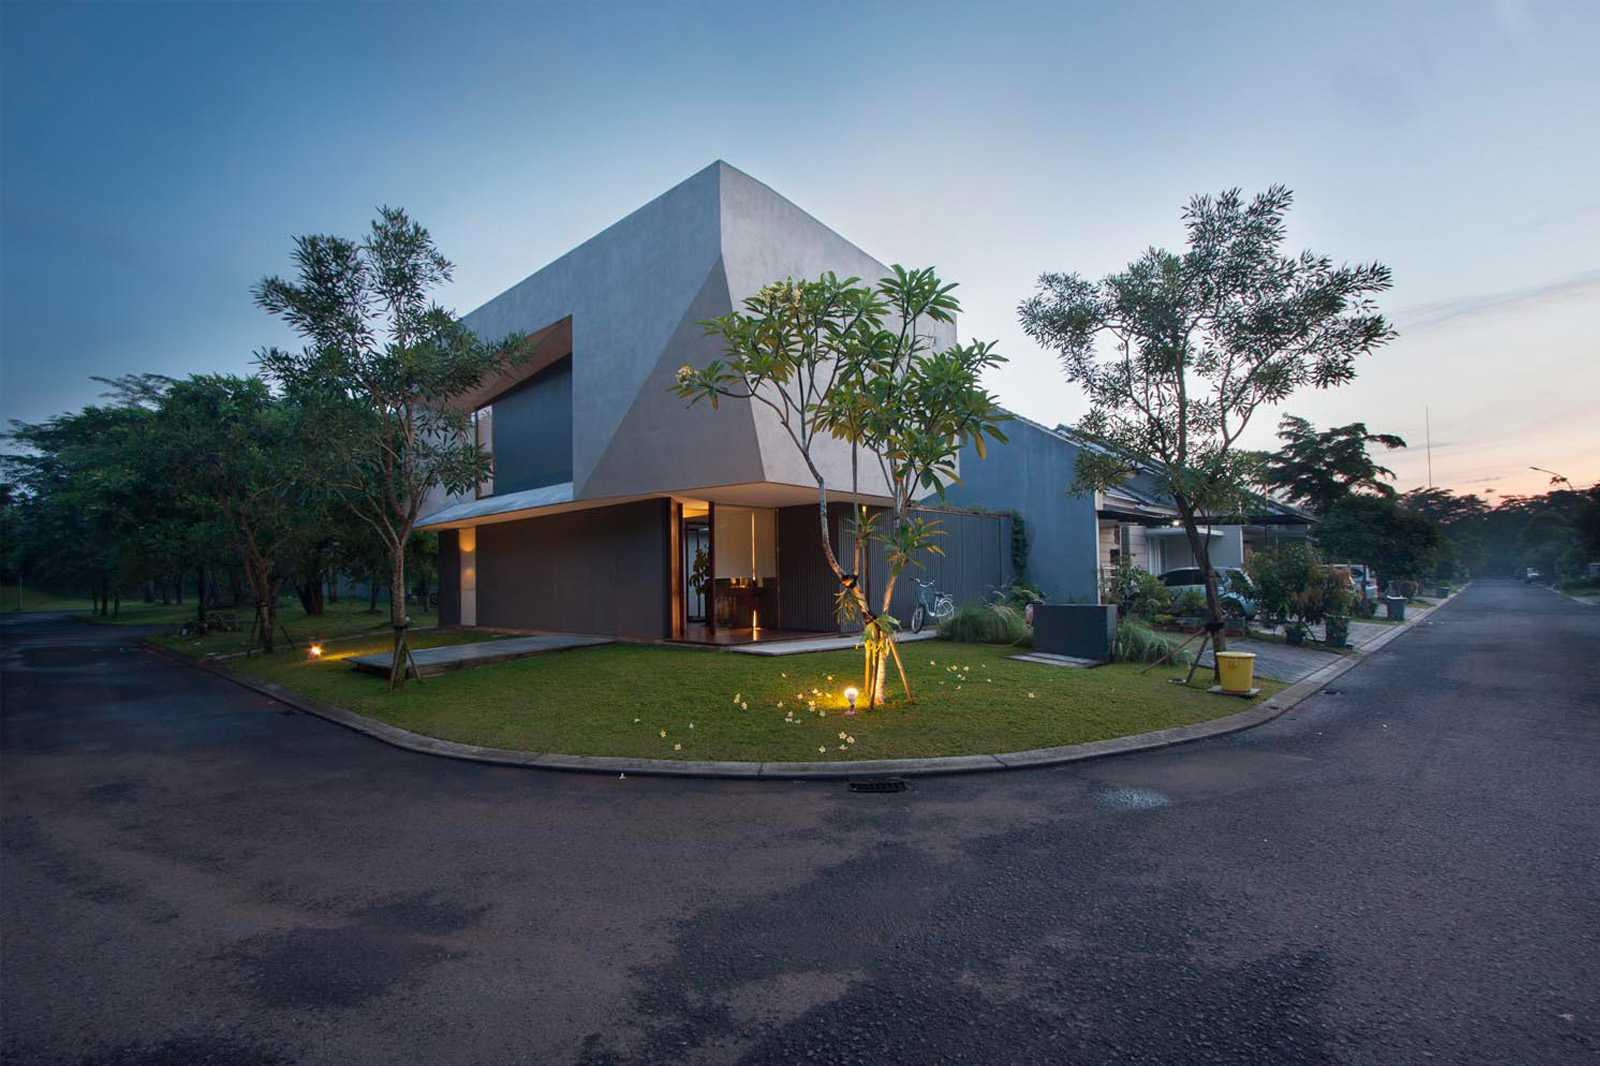 Armschitecture House Of Trimmed Reform Tangerang, Kota Tangerang, Banten, Indonesia Tangerang, Kota Tangerang, Banten, Indonesia Arms-Studio-House-Of-Trimmed-Reform   65856